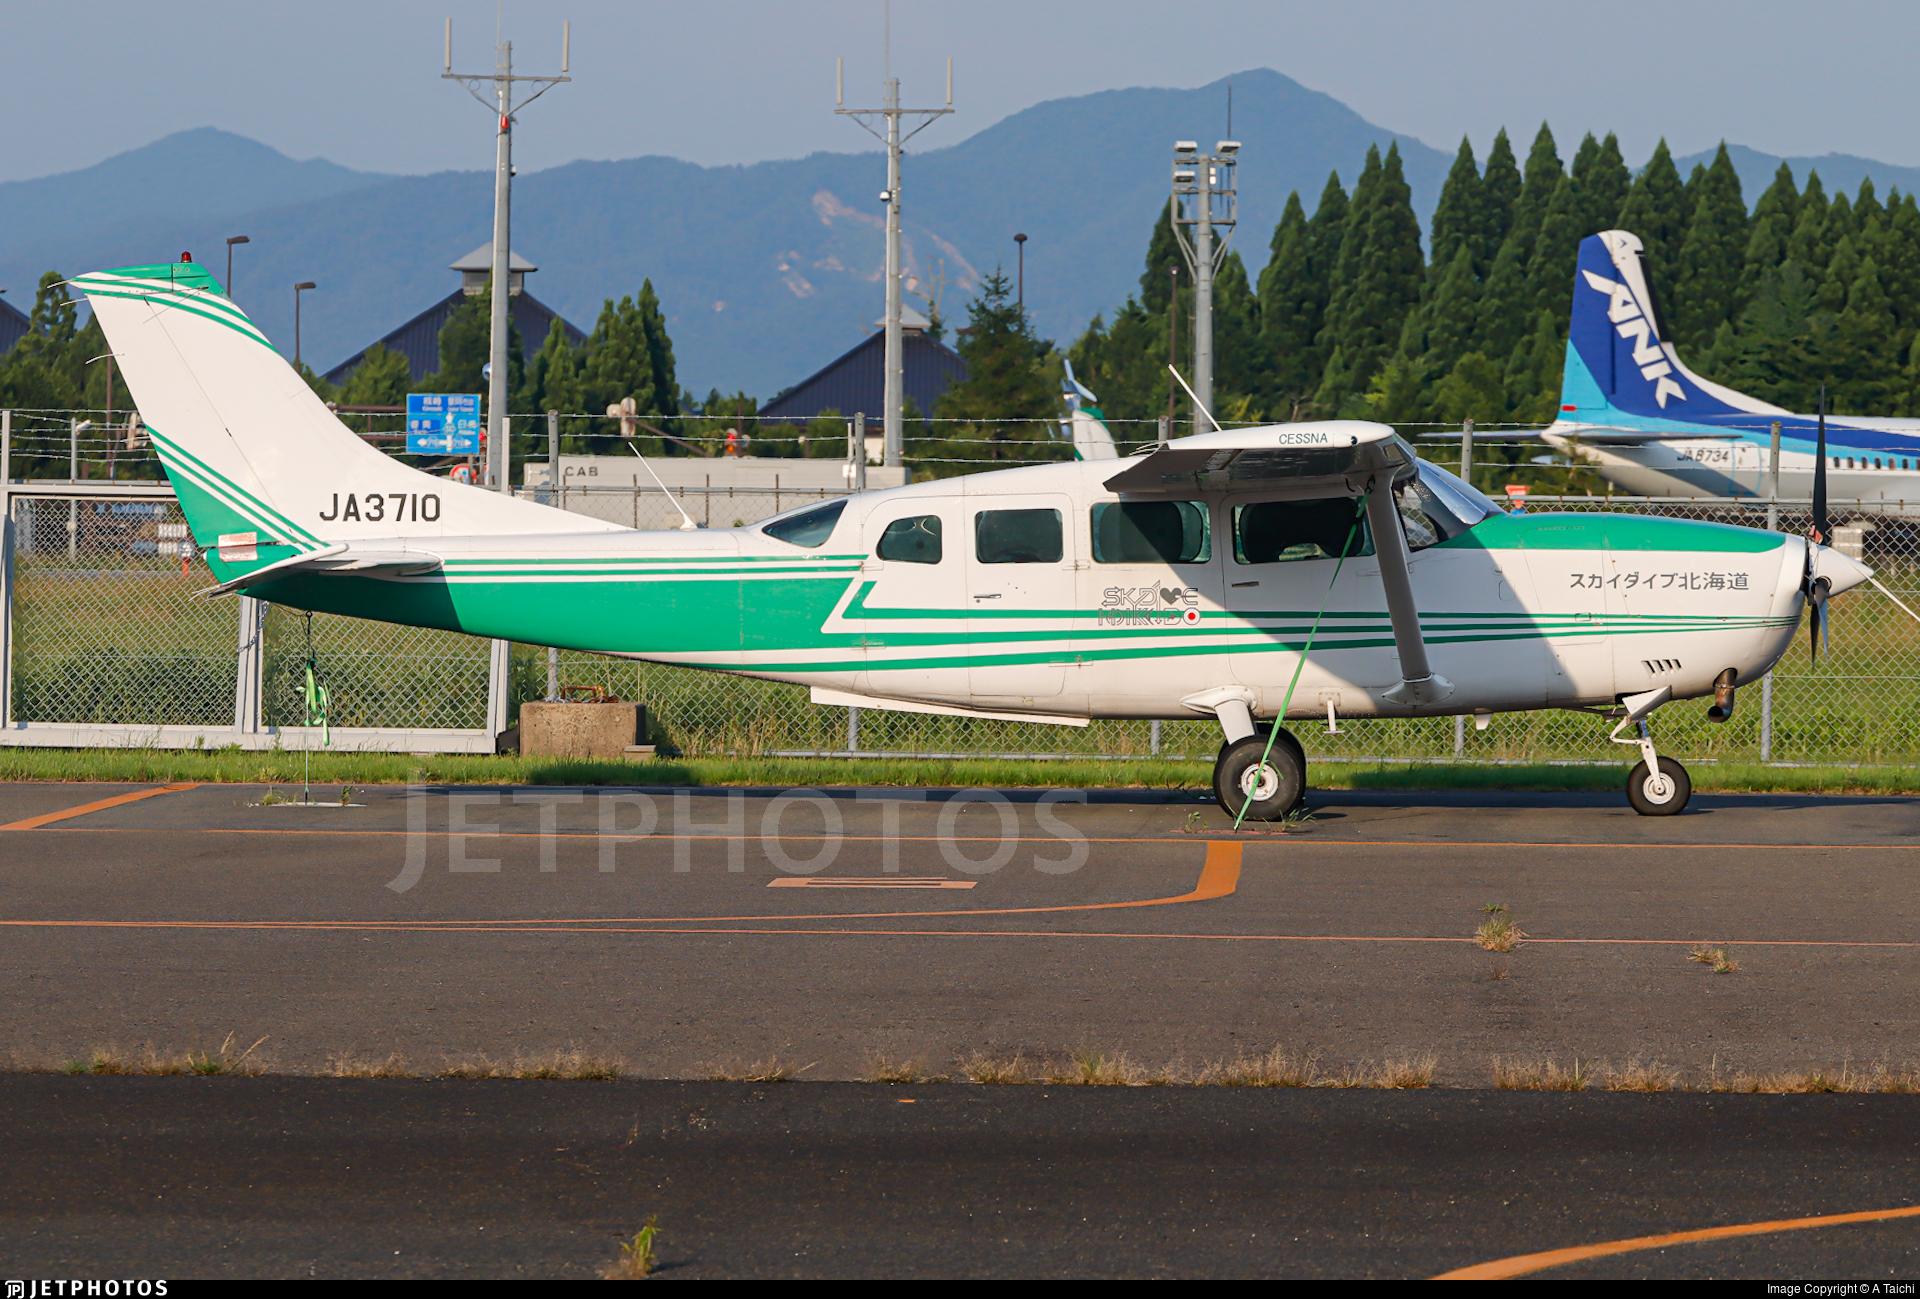 JA3710 - Cessna T207 Turbo Skywagon - Private